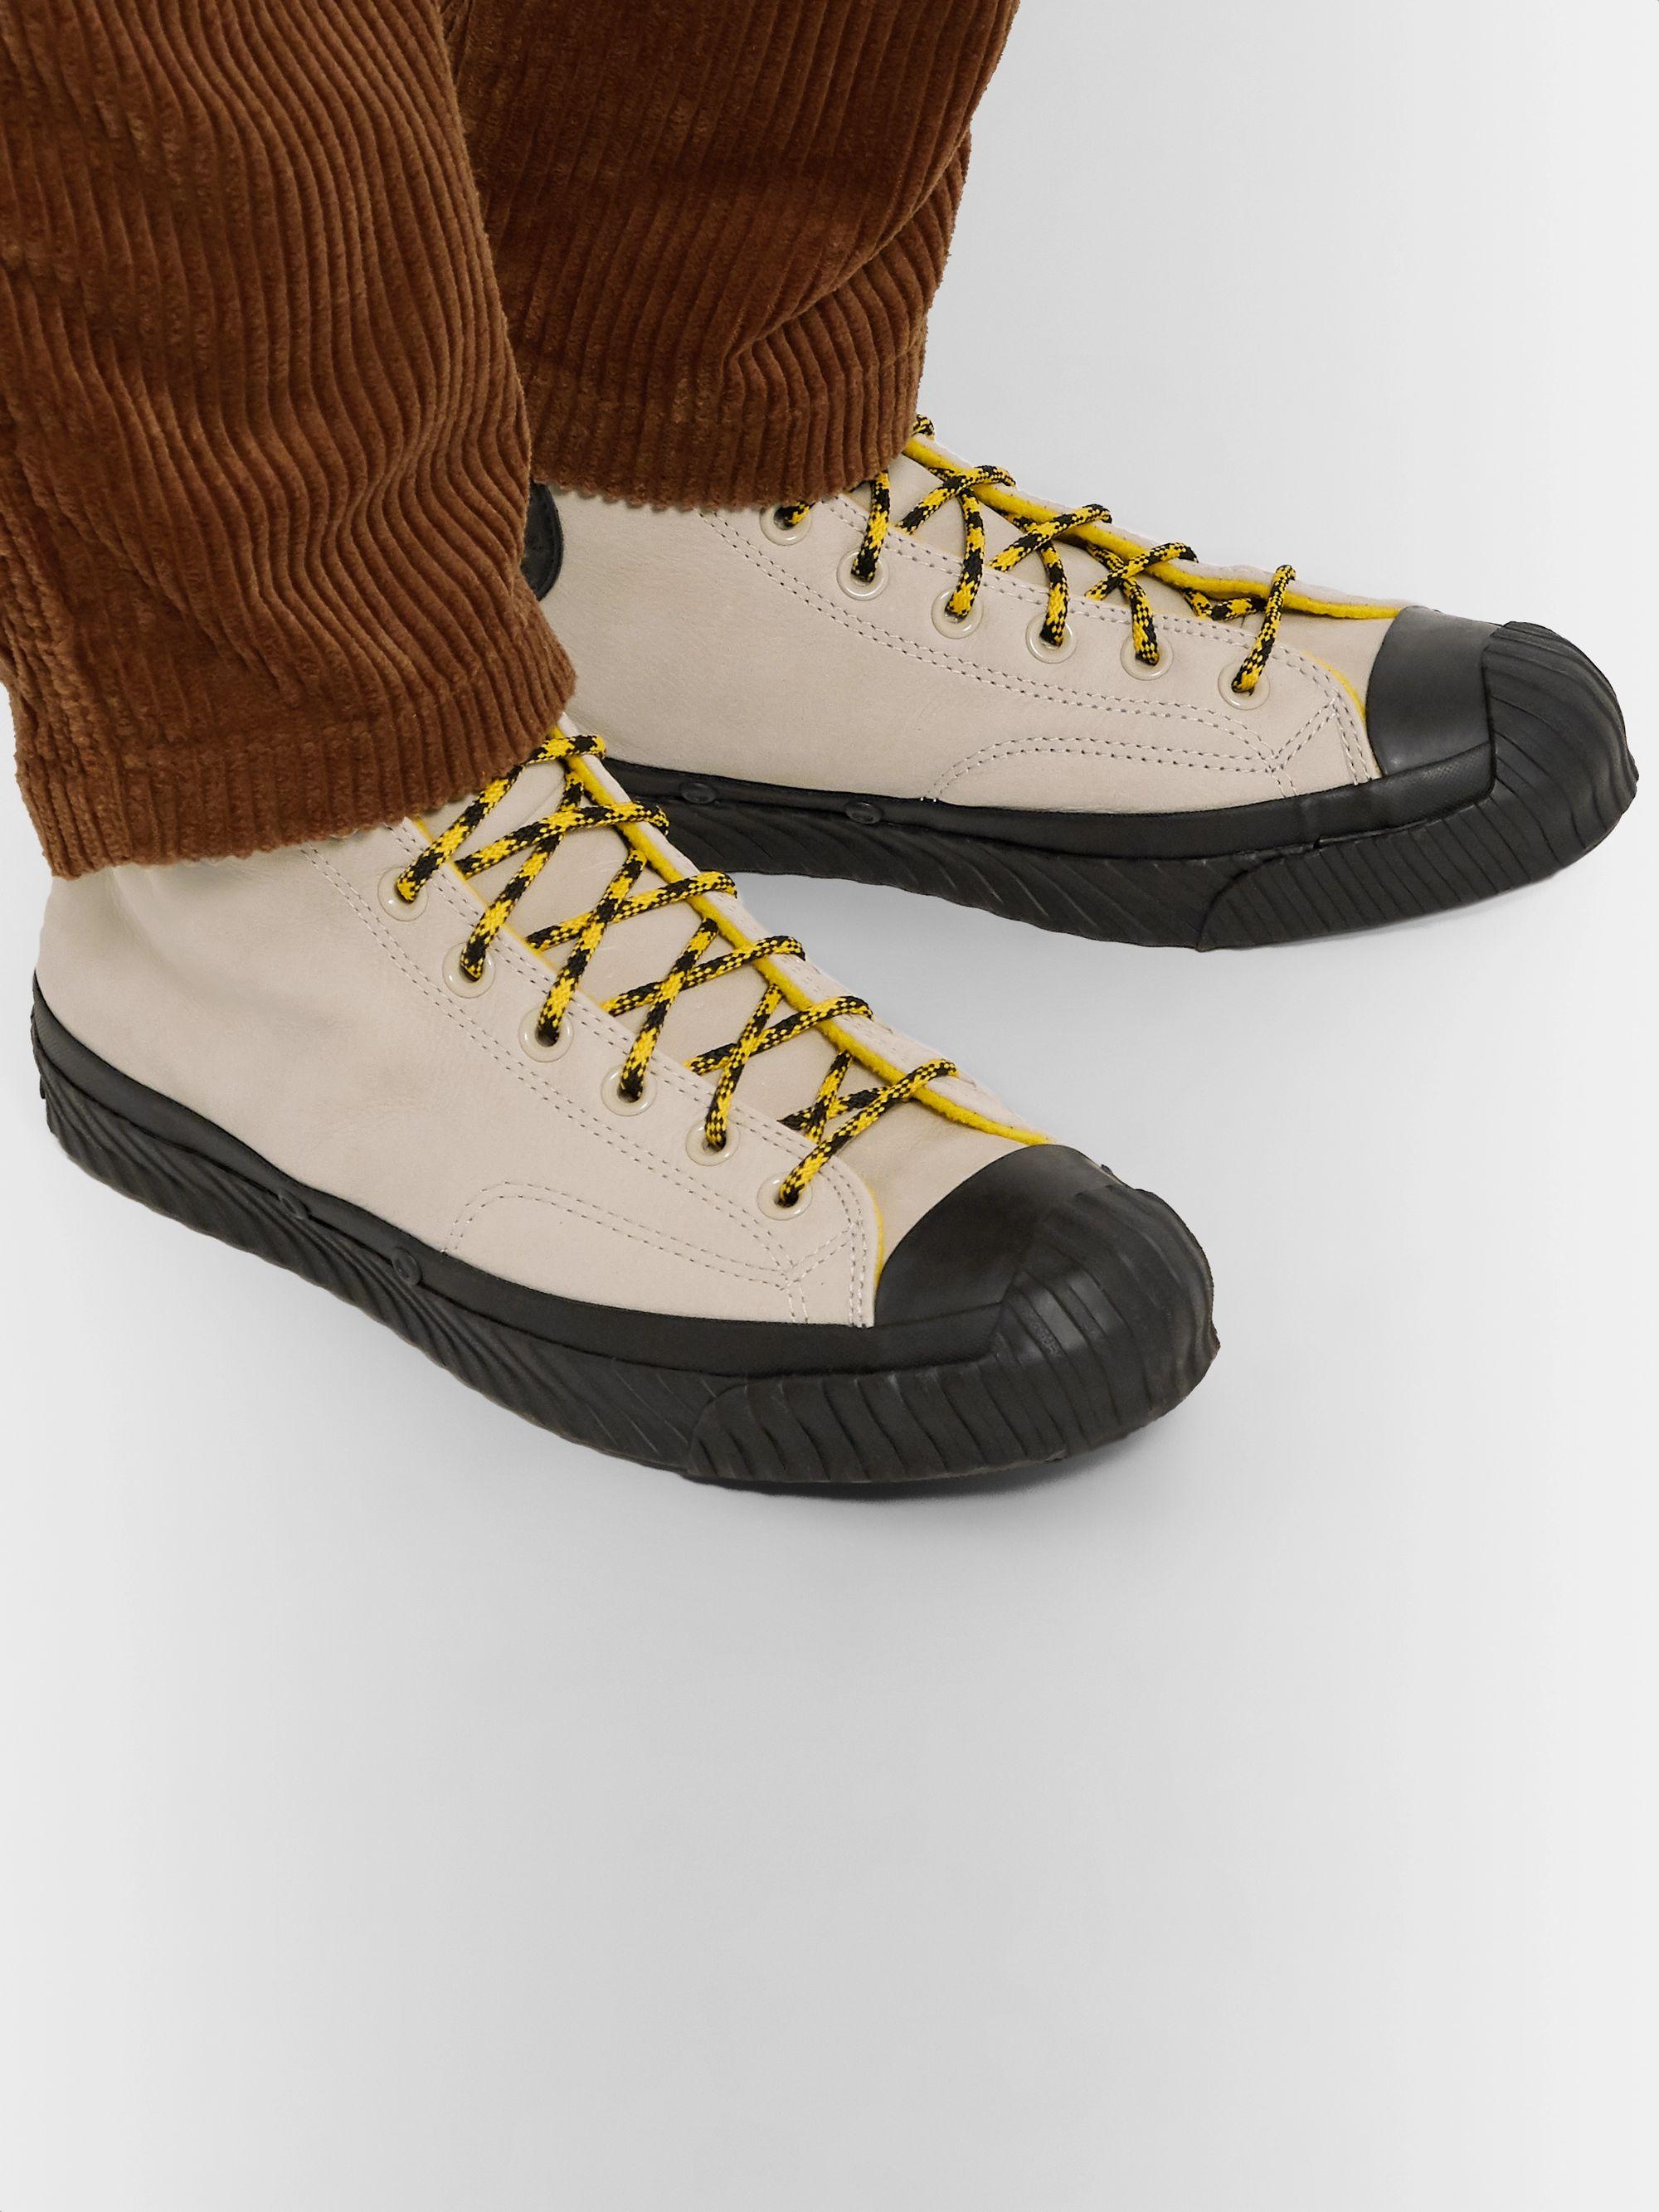 Converse Chuck 70 Fleece Lined Leather High Top Sneaker